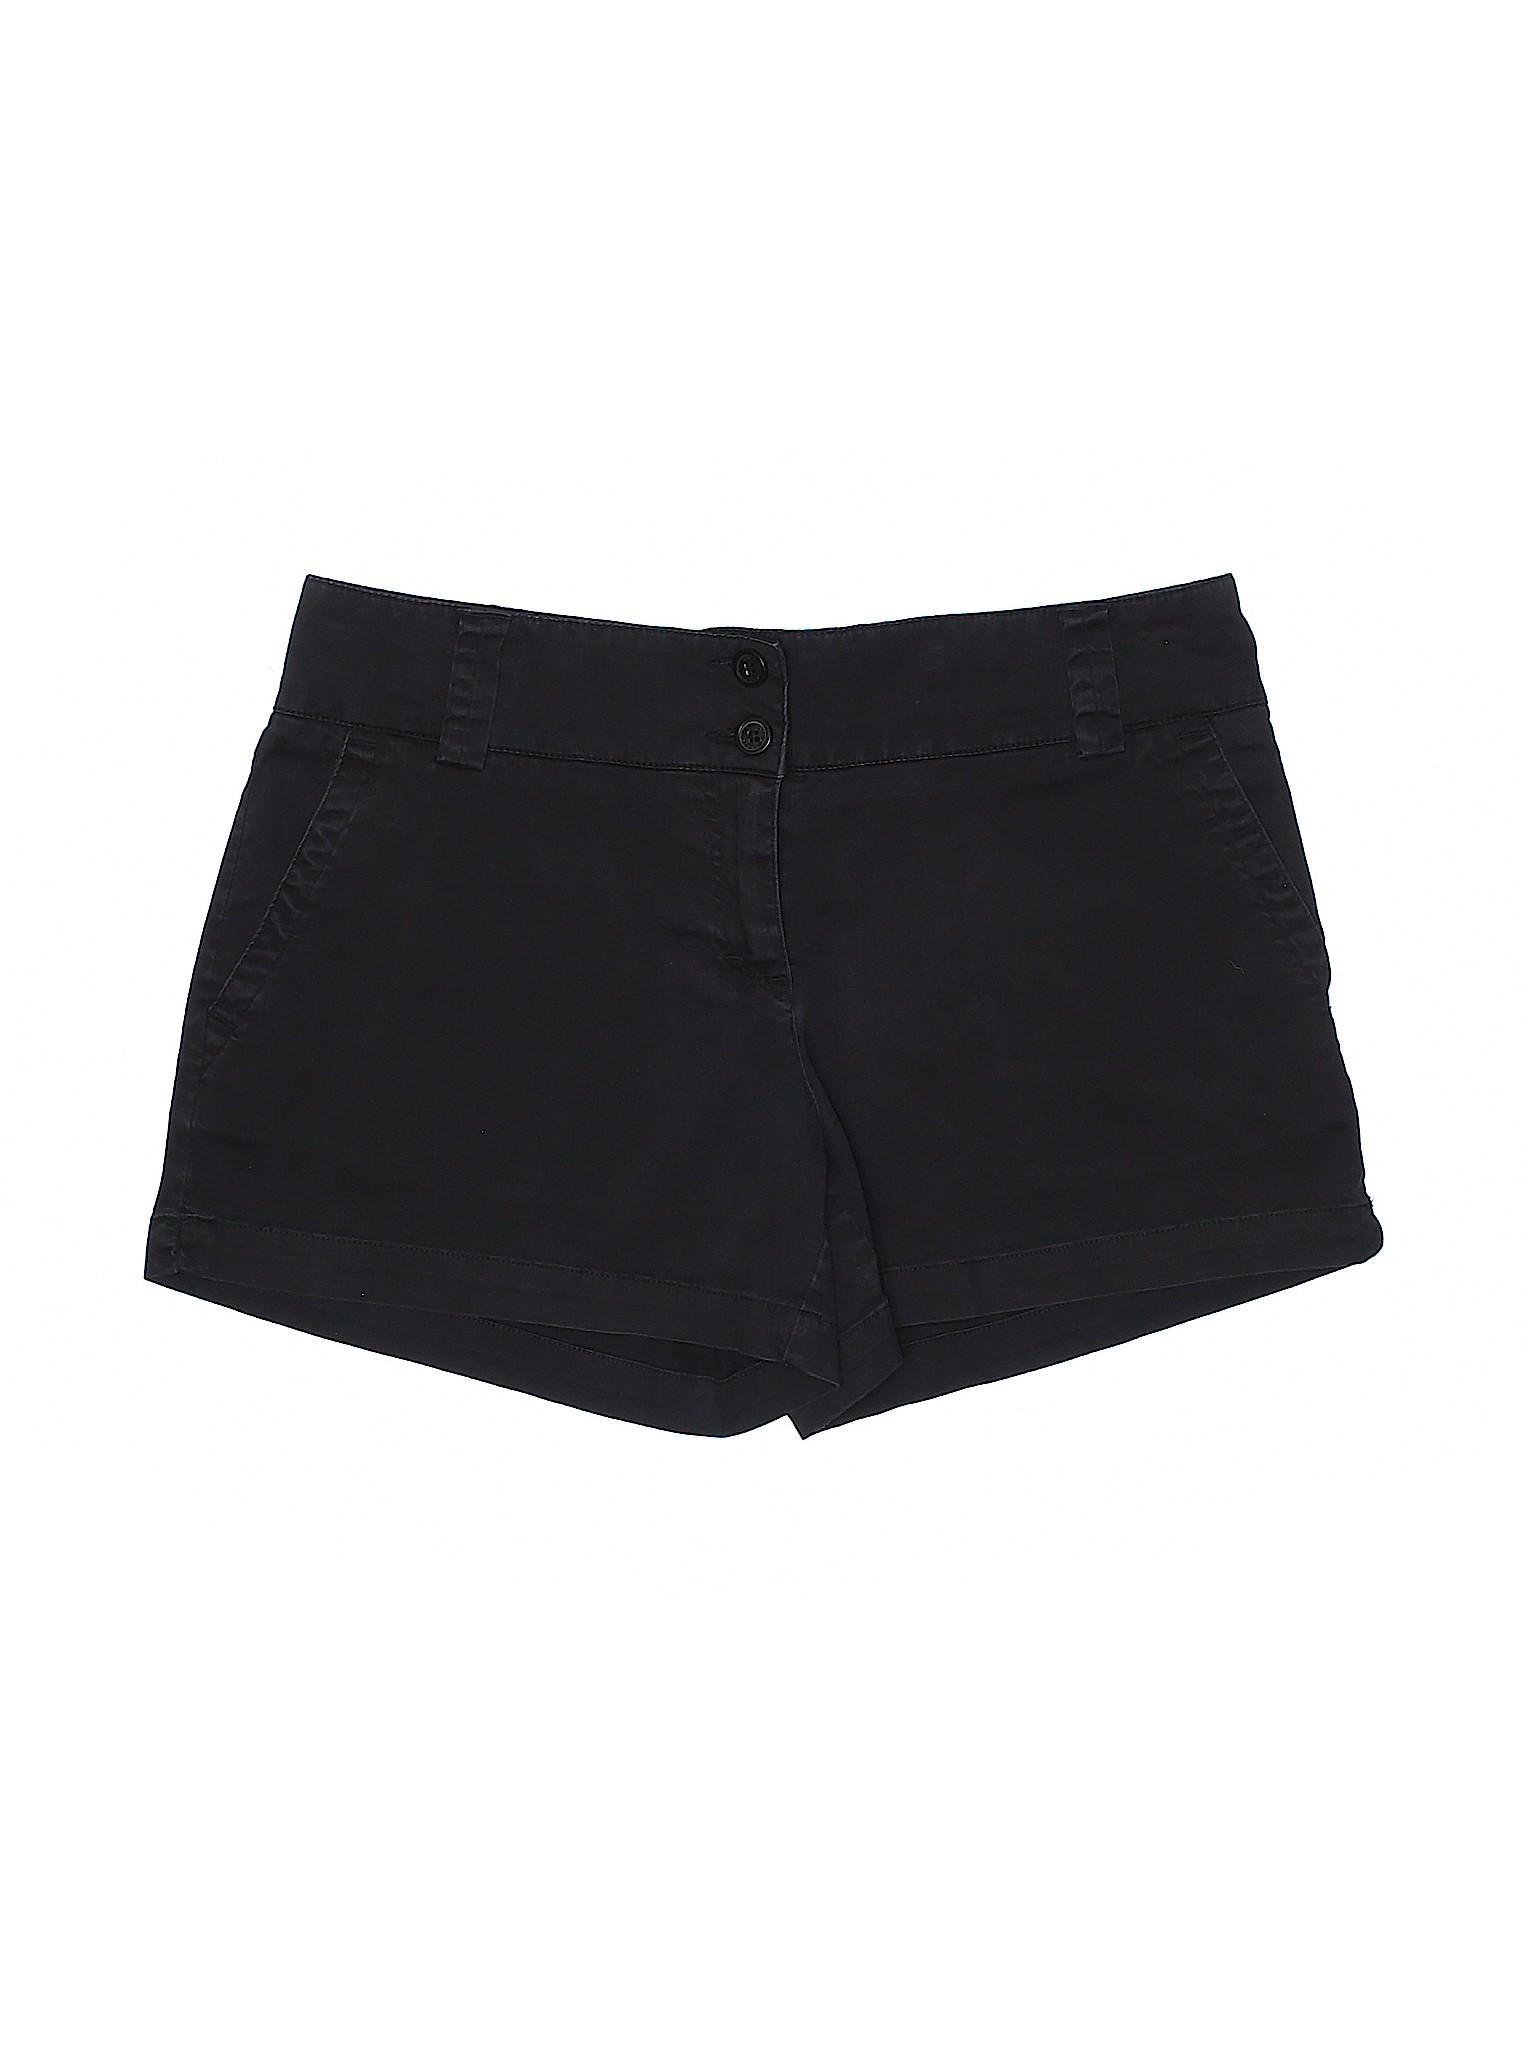 winter amp; New Company Khaki York Shorts Boutique gOqSw